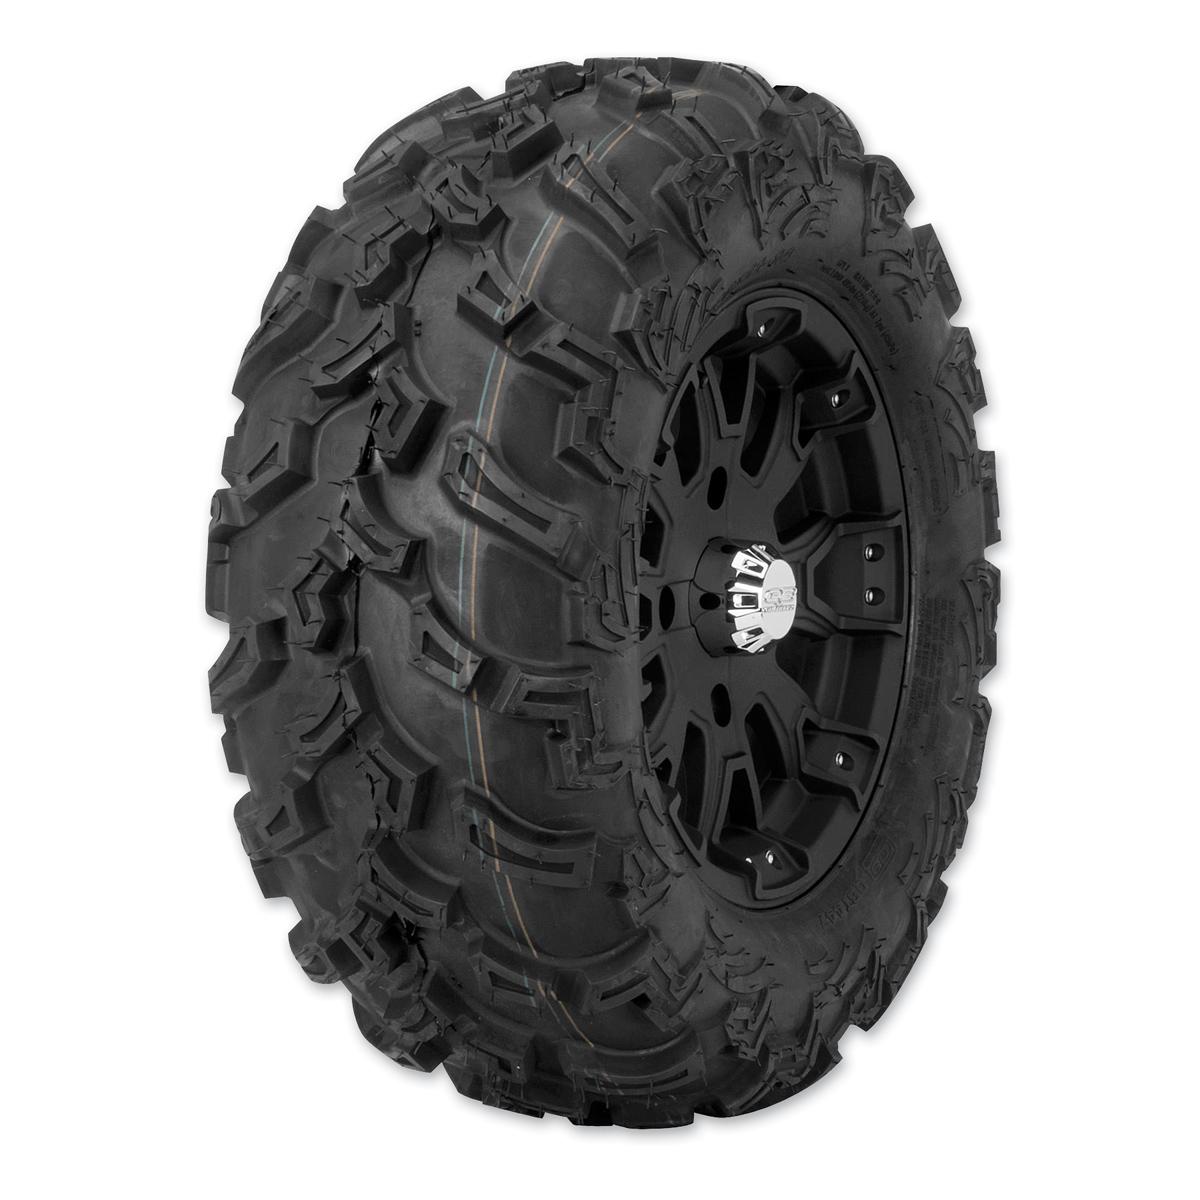 Quadboss QBT447 26X11-14 6-Ply Rear Tire